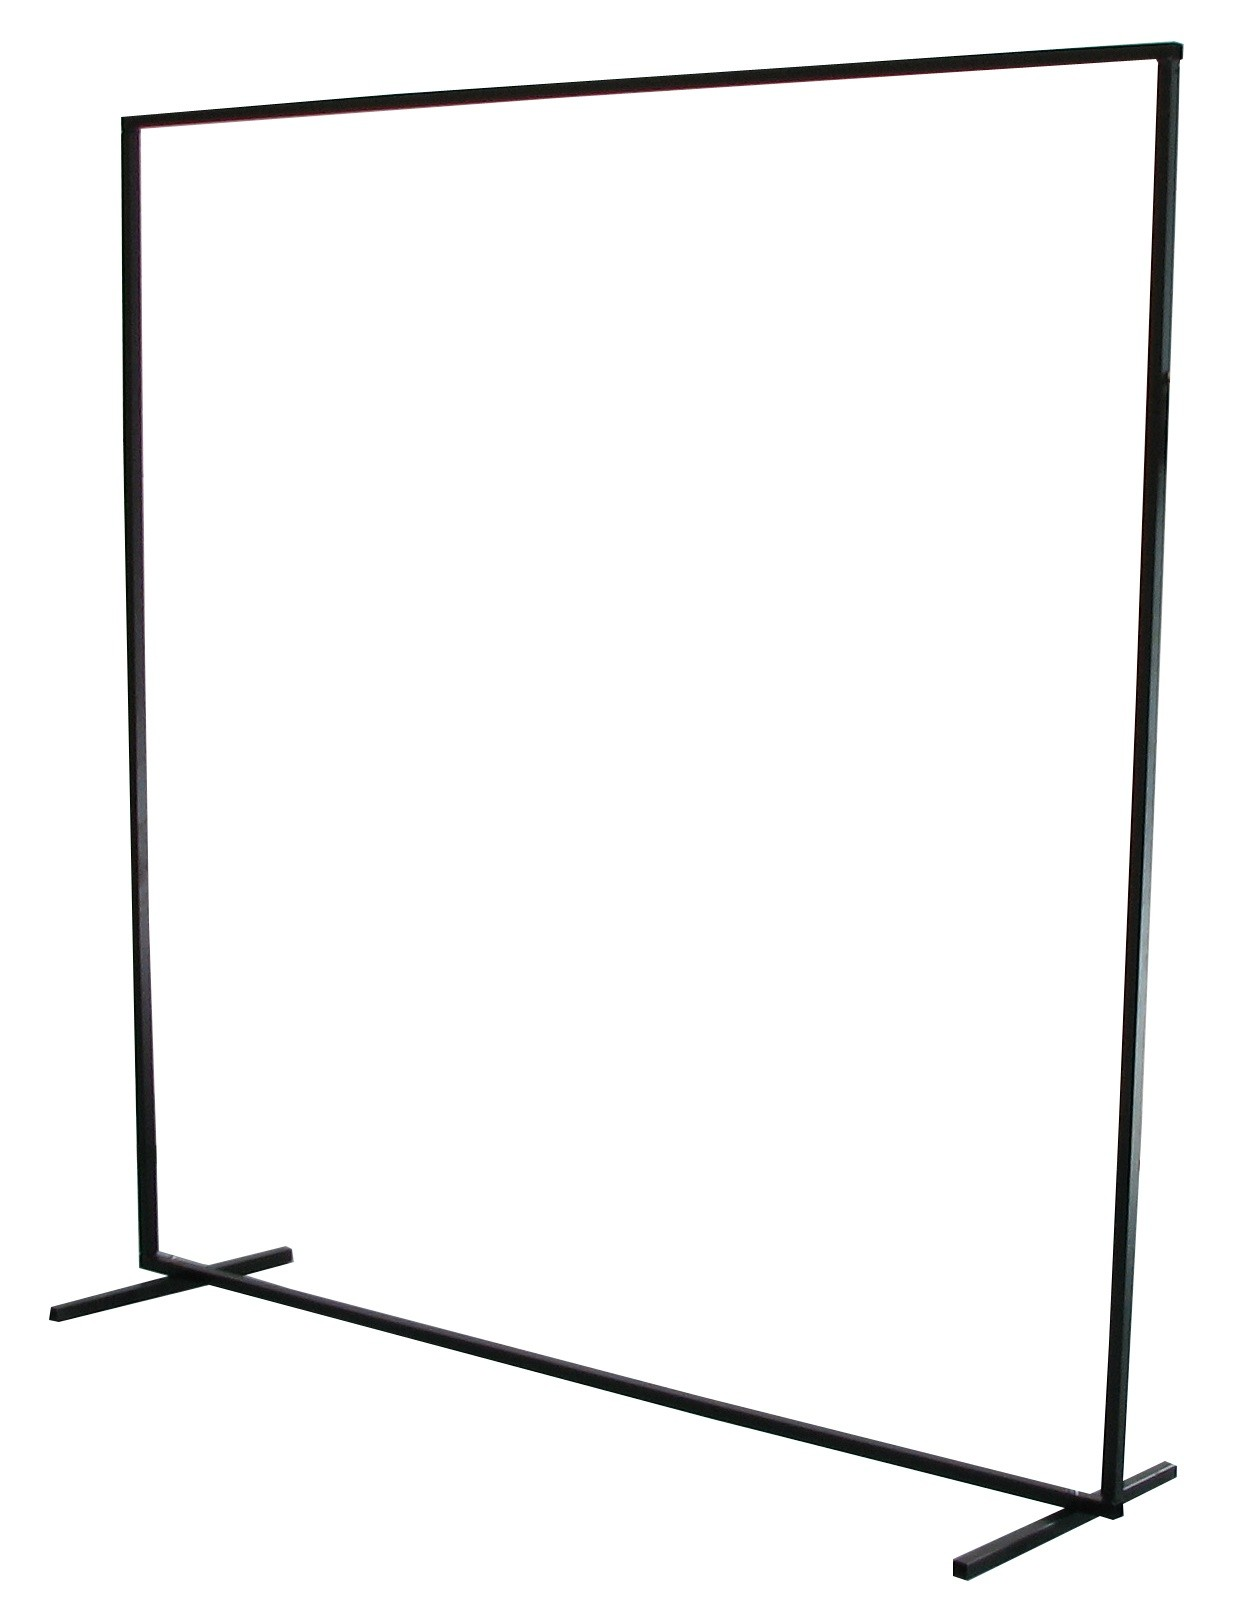 Portable Frames for Welding Curtain